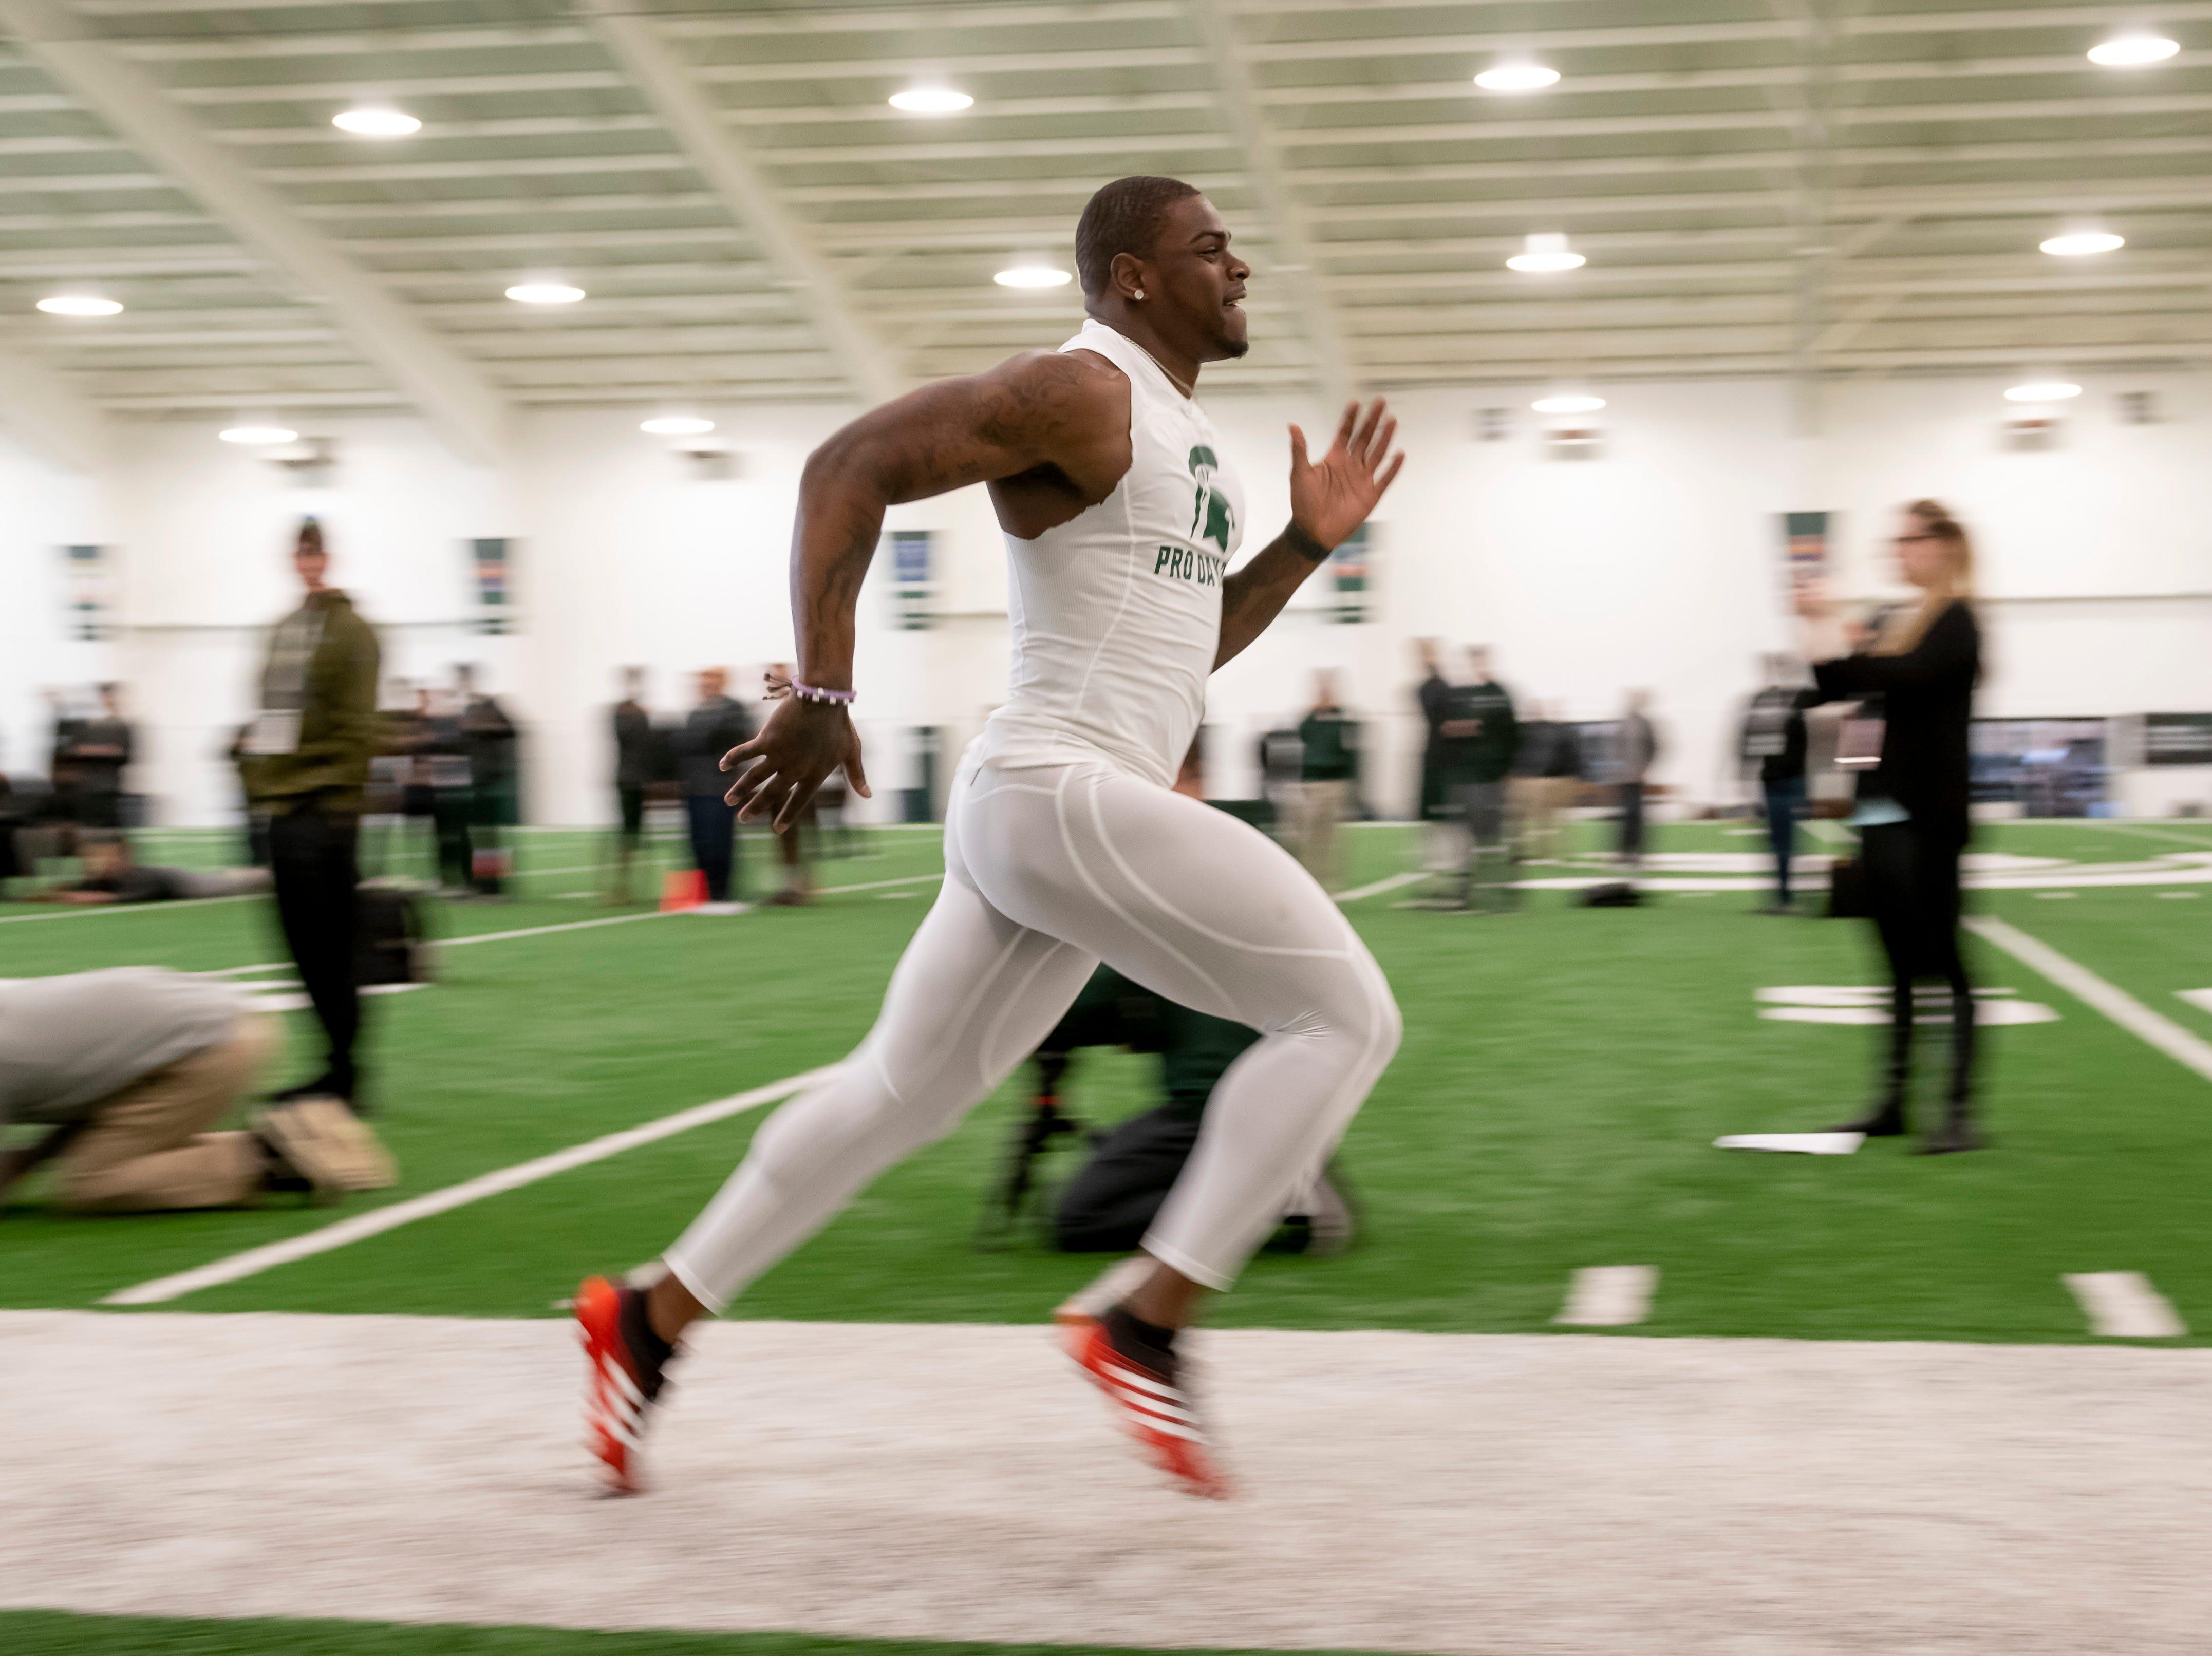 Michigan State running back LJ Scott runs the 40-yard-dash.